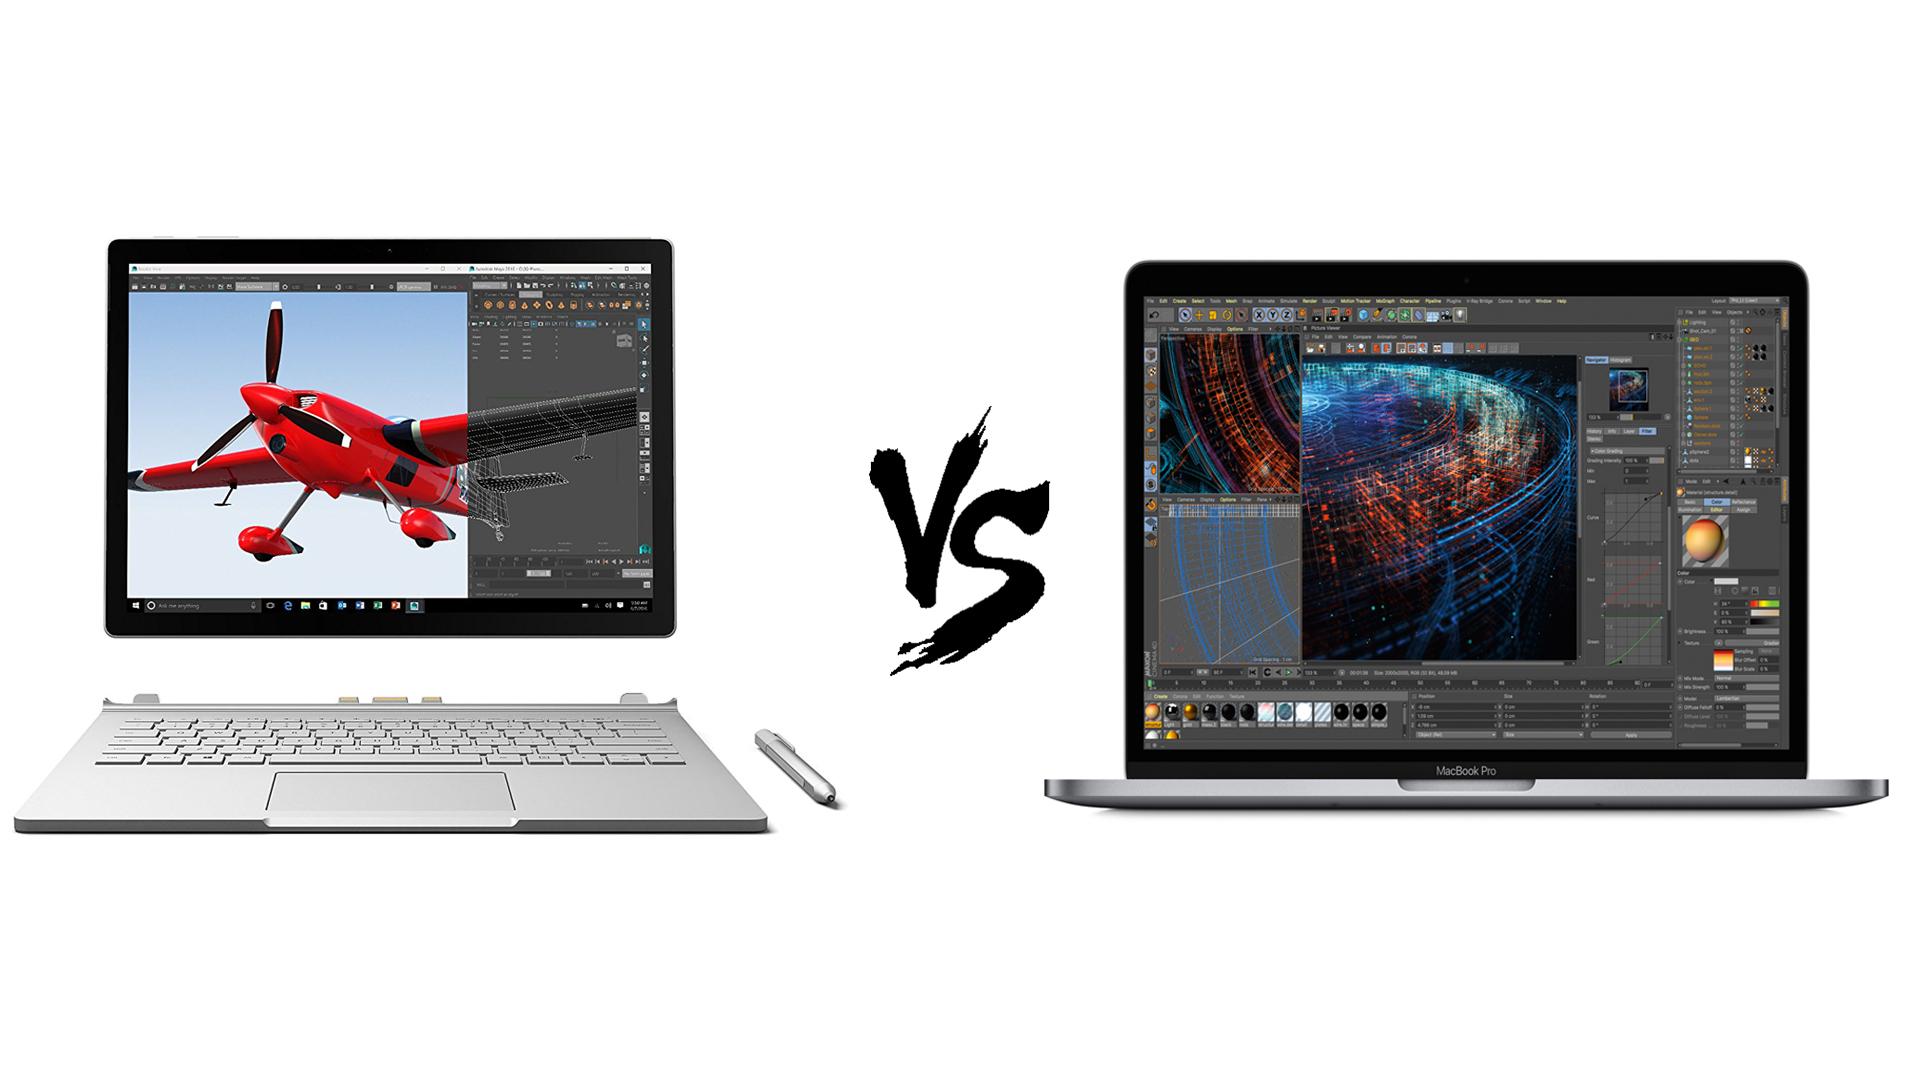 Macbook Pro 2018 Vs Surface Book 2 The Most Premium Pro Laptops Compared Techradar